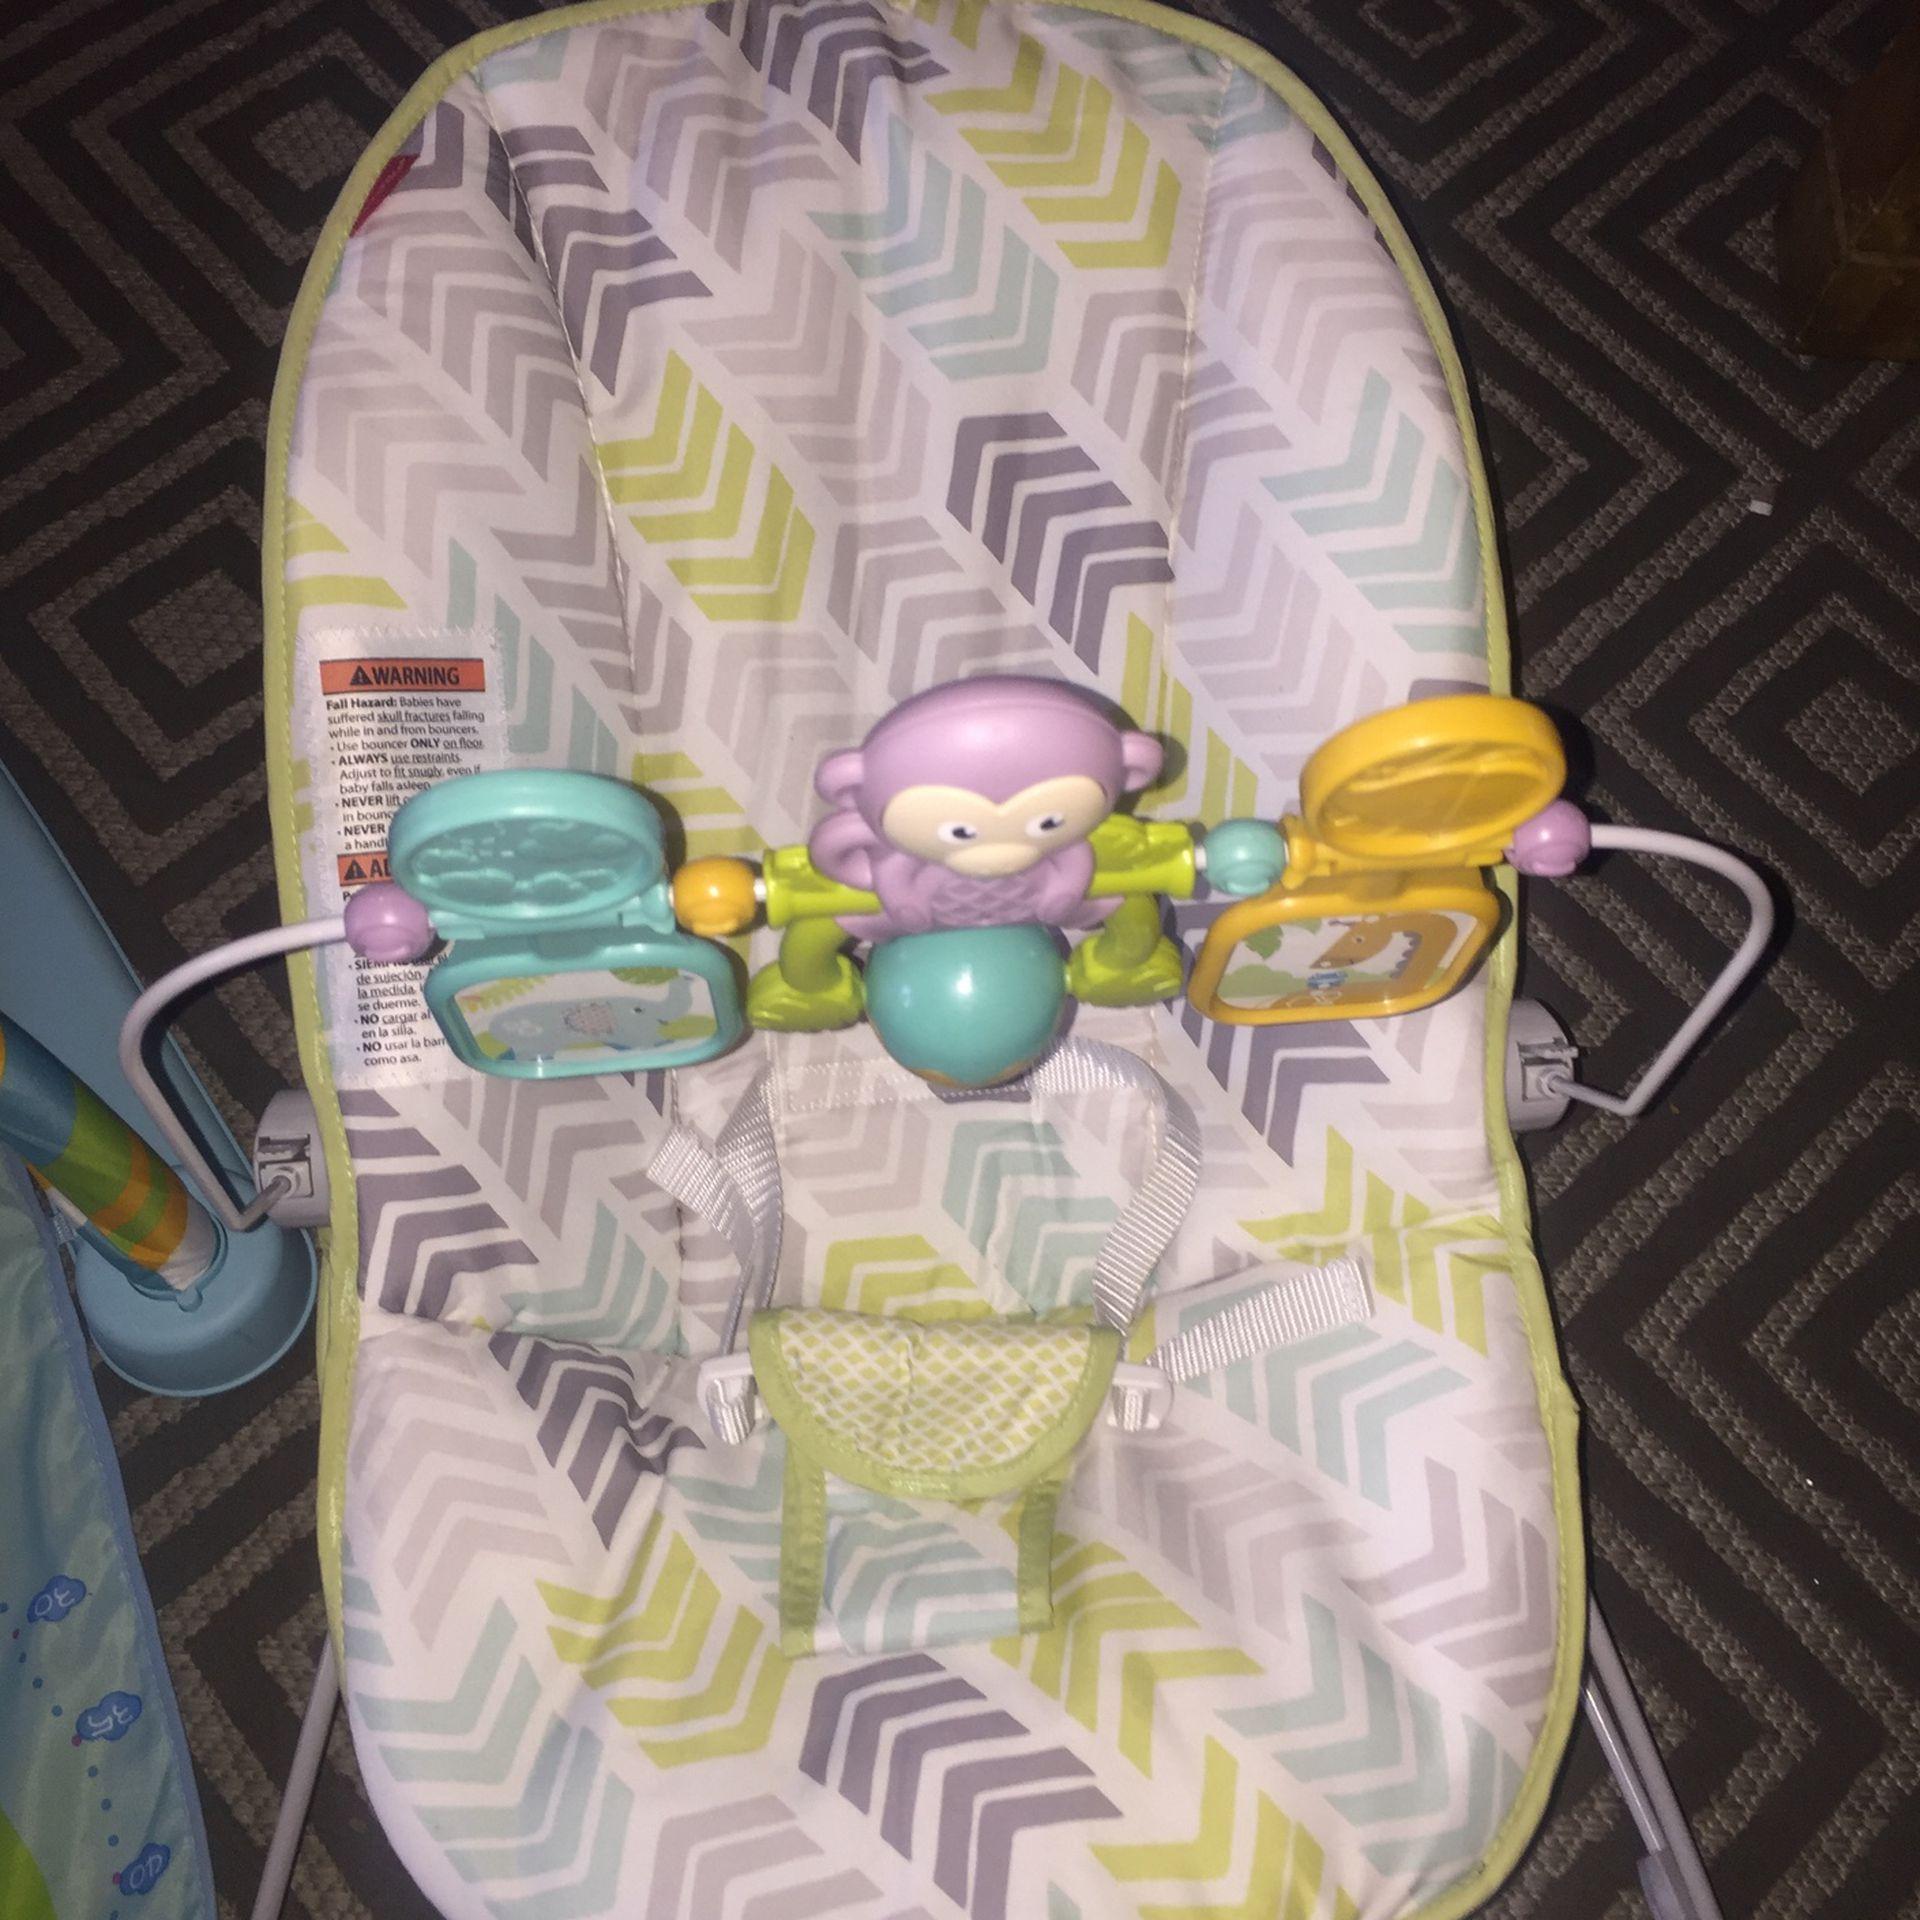 Baby Bouncer And Baby Tummy Kick & Play